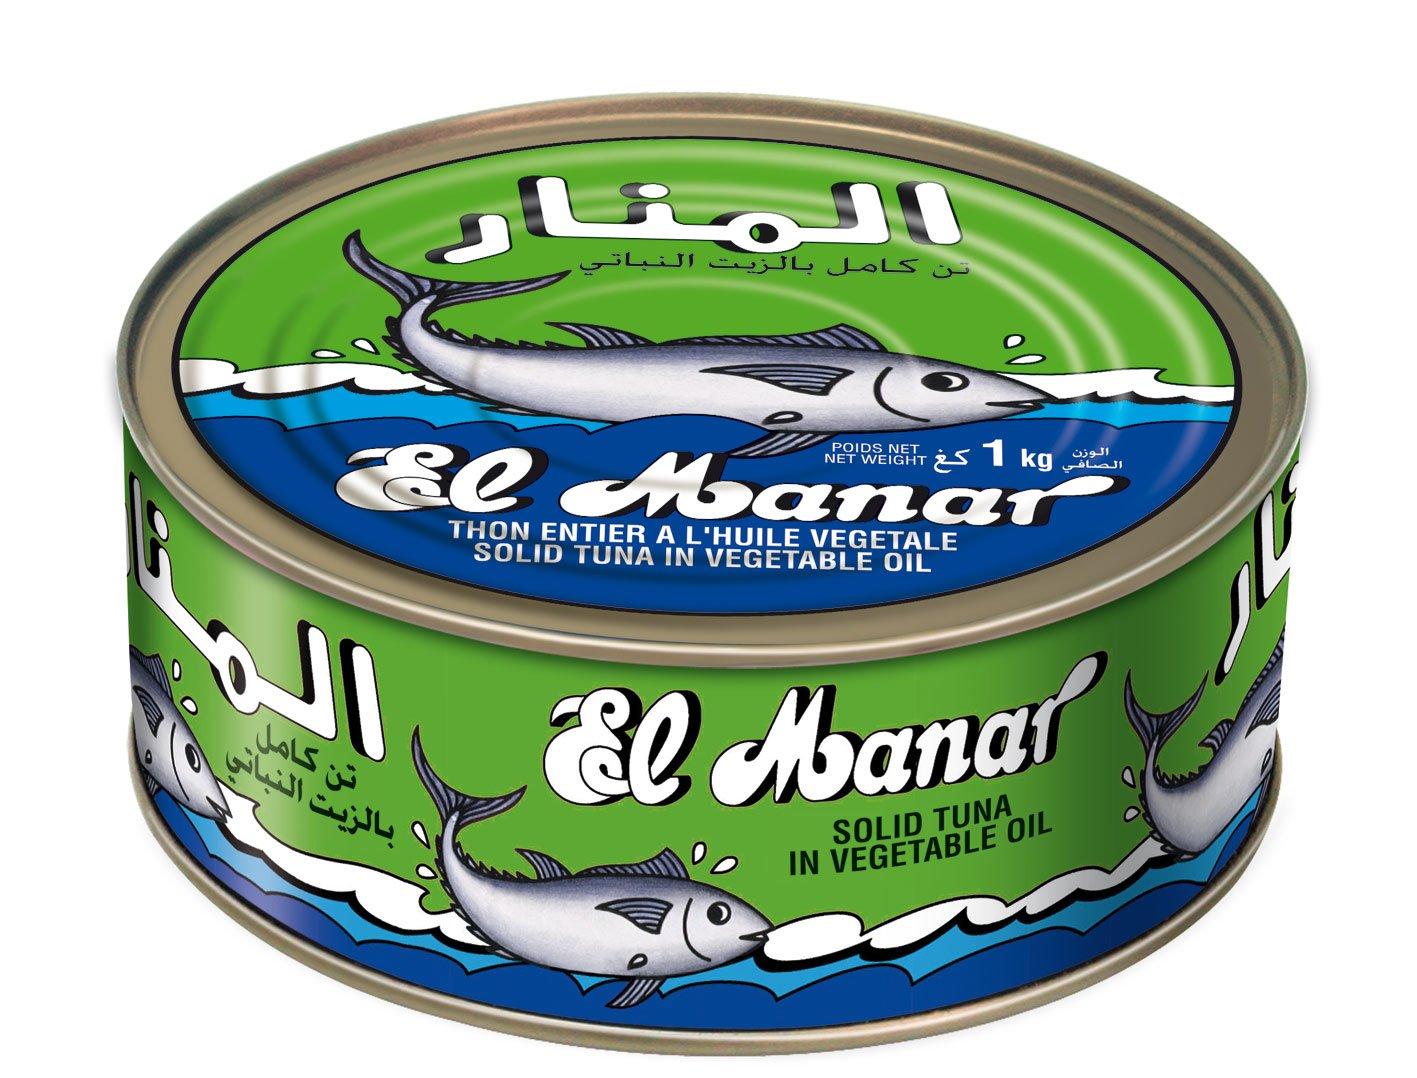 El Manar Tuna in New York Mall Vegetable Oil Box 1 Kg; of Popular brand 2